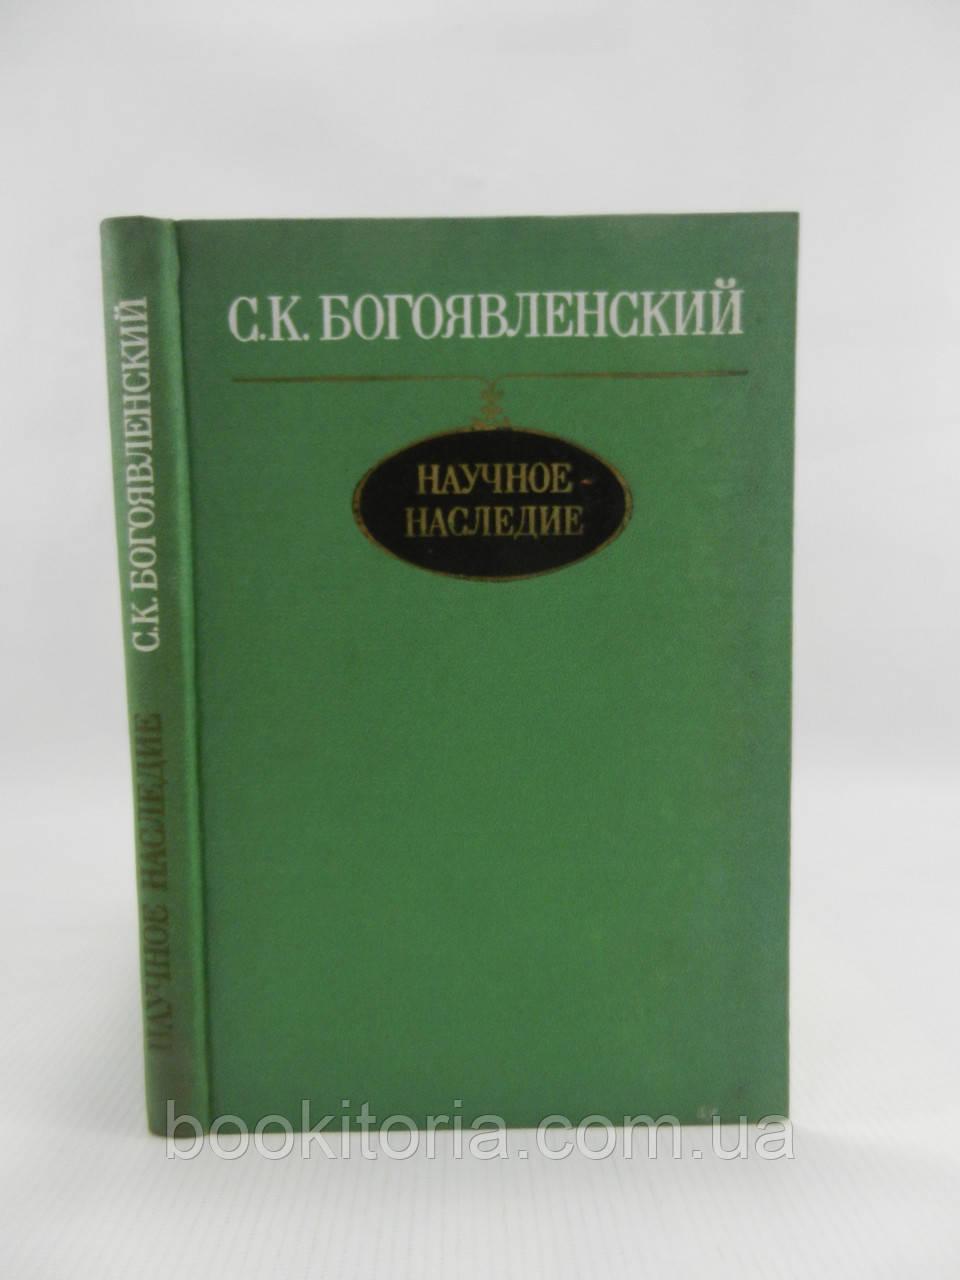 Богоявленский С. Научное наследие. О Москве XVII века (б/у).